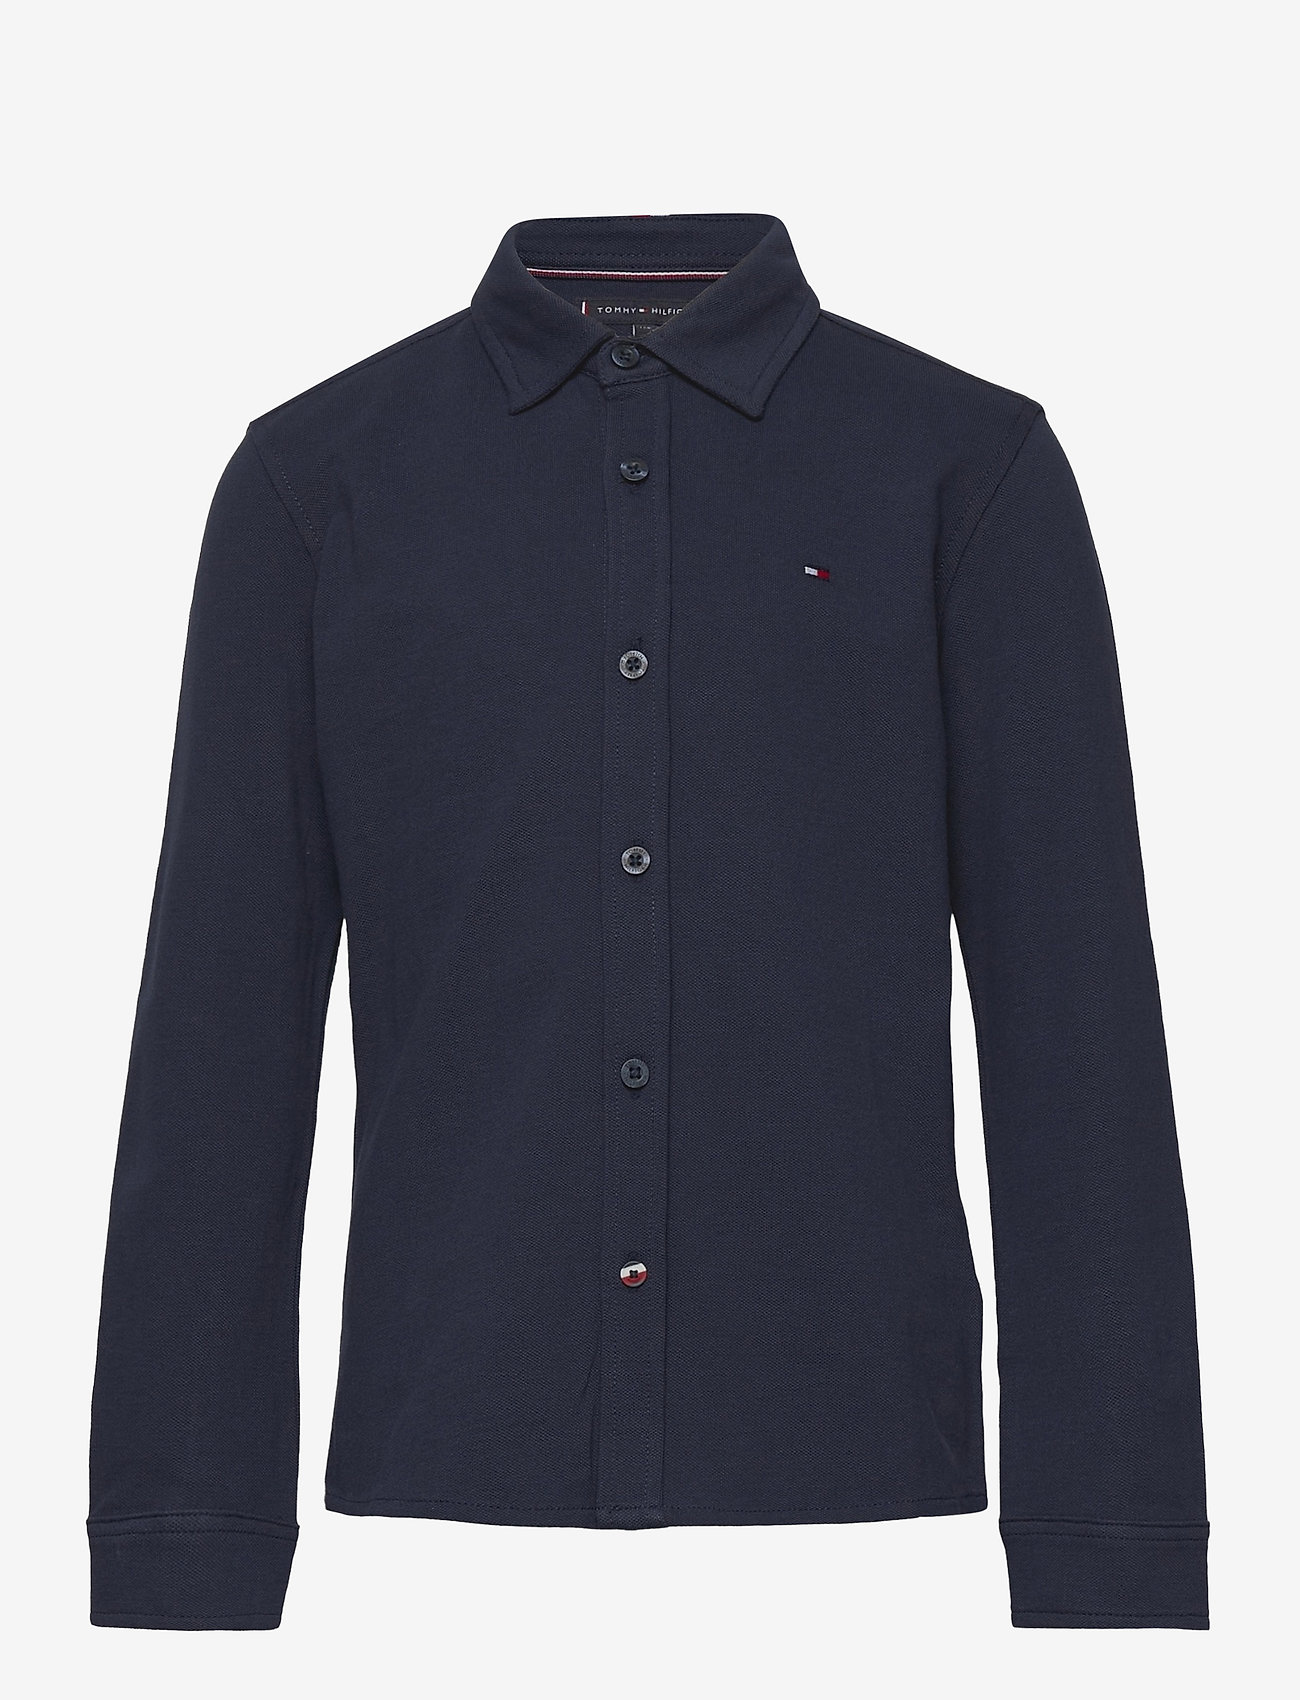 Tommy Hilfiger - STRETCH PIQUE SHIRT L/S - shirts - twilight navy - 0